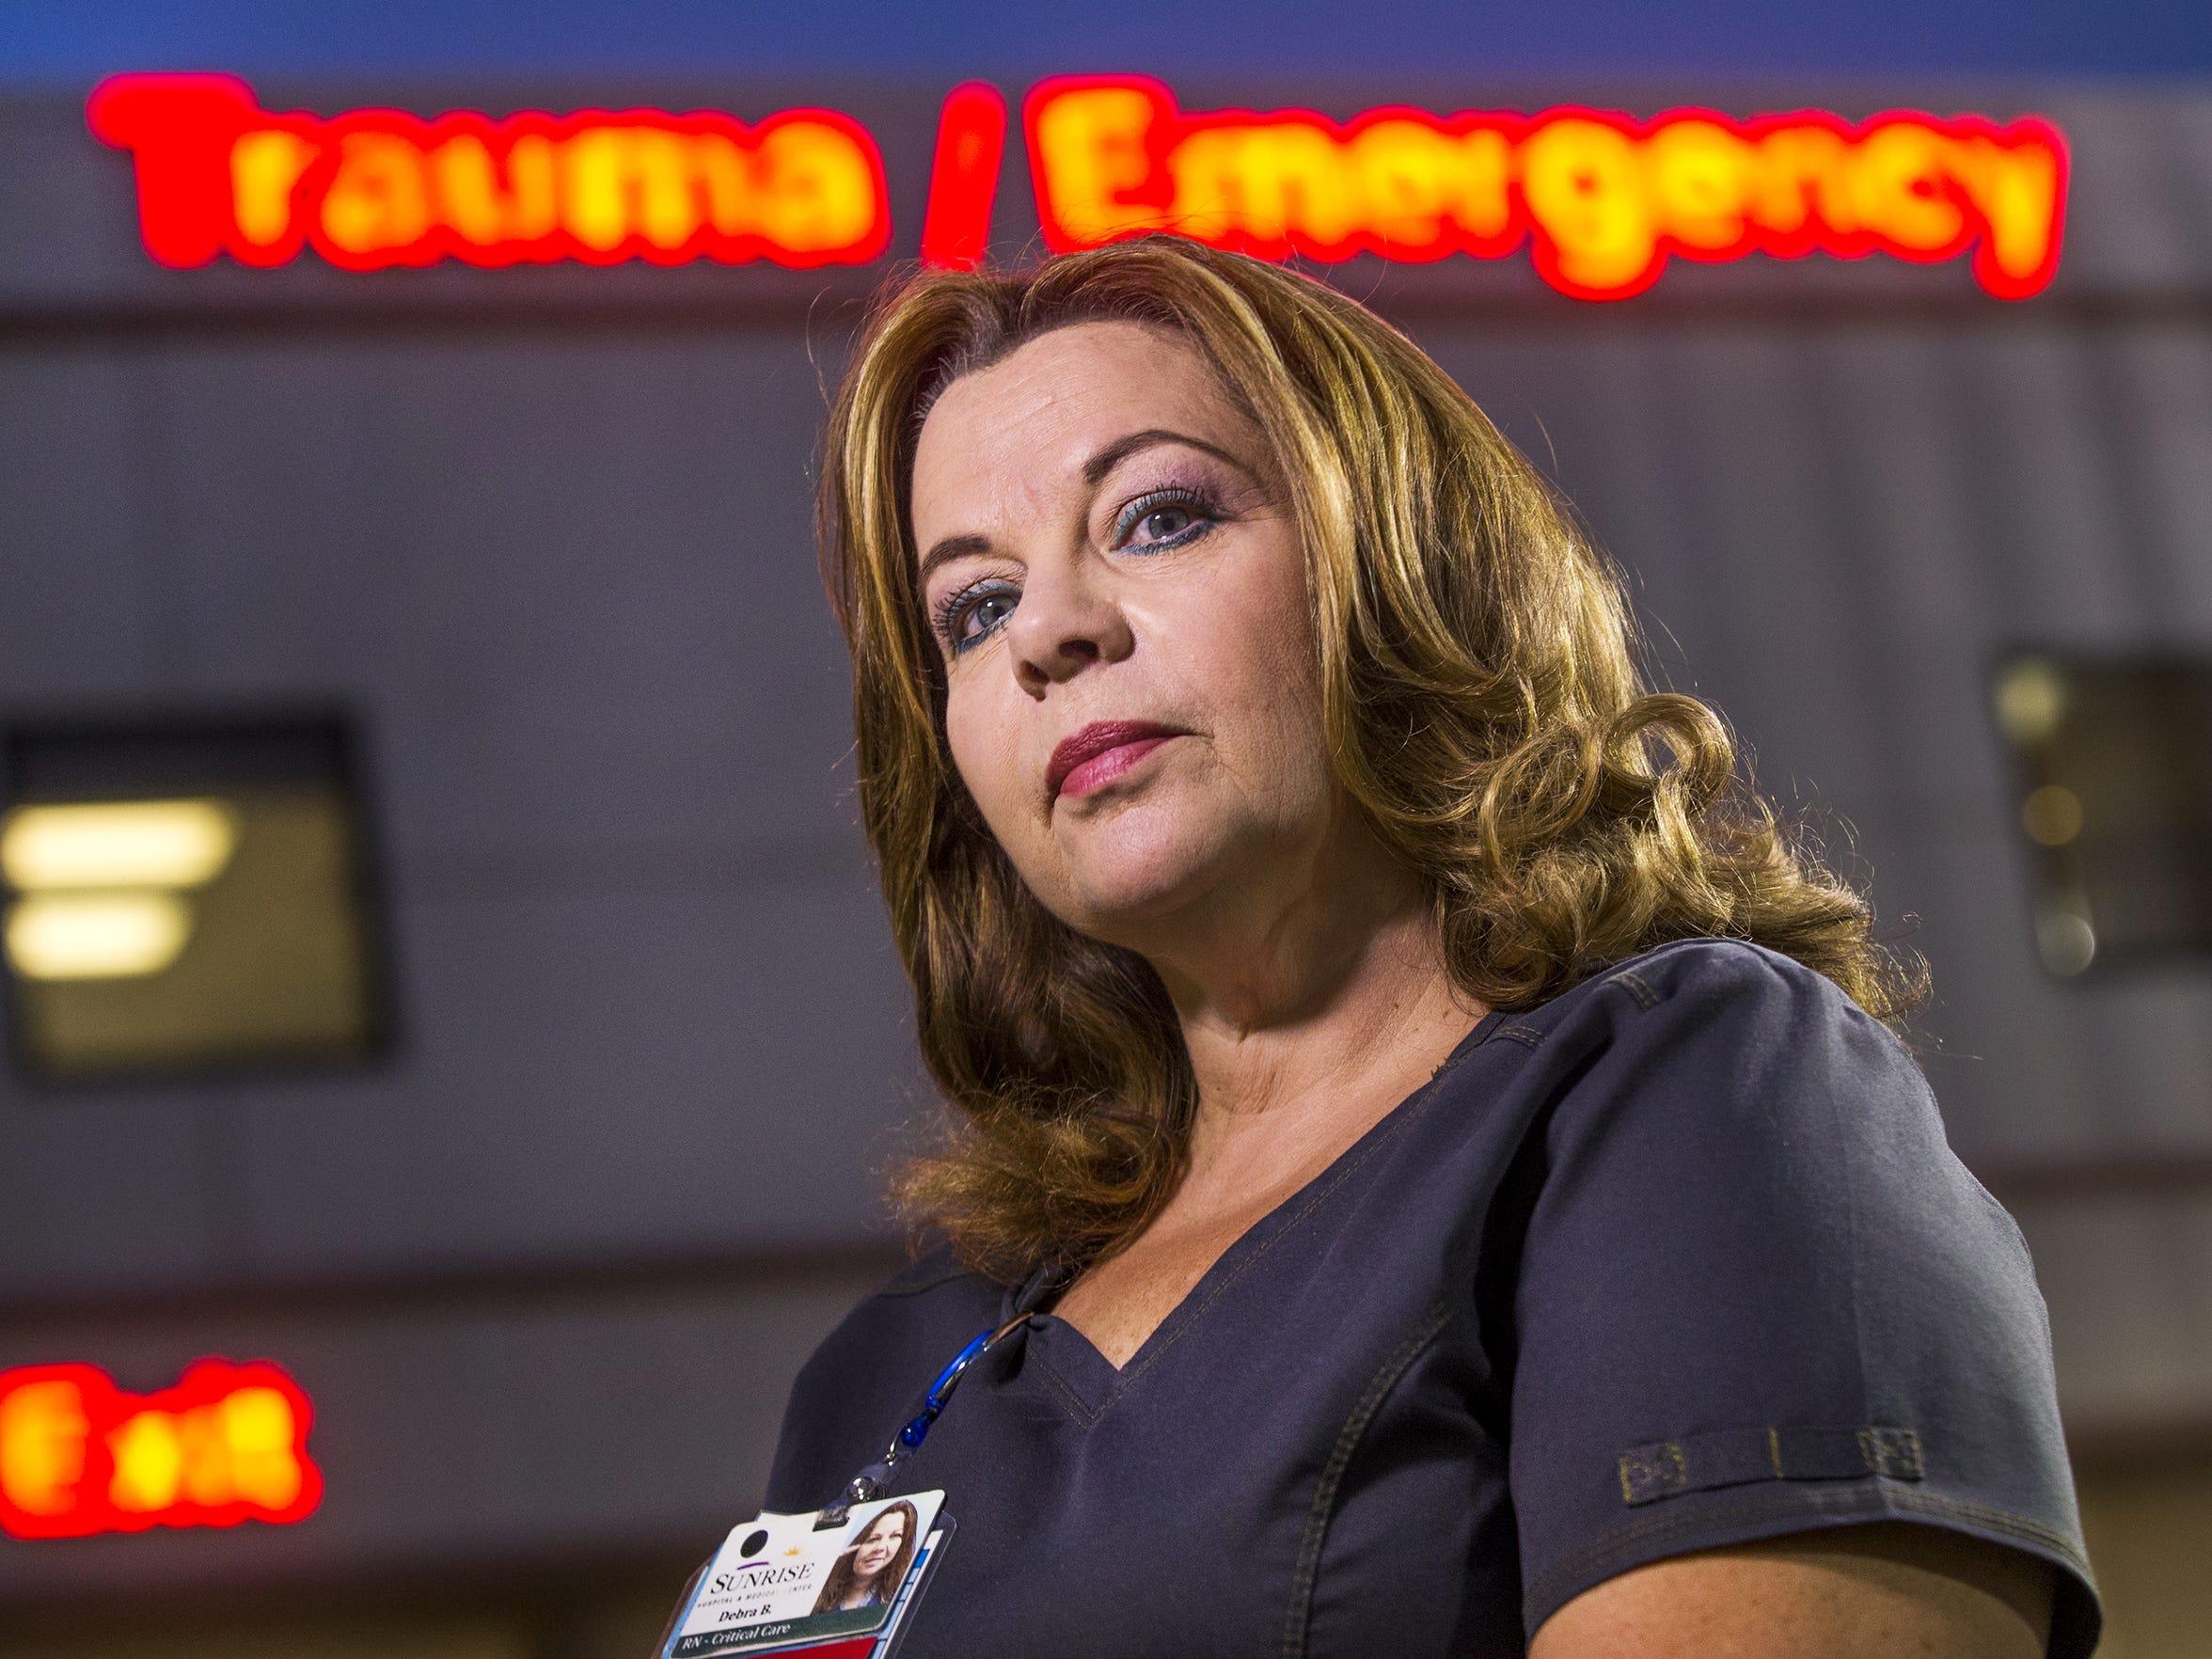 Debbie Bowerman, a nurse at Sunrise Hospital and Medical Center.